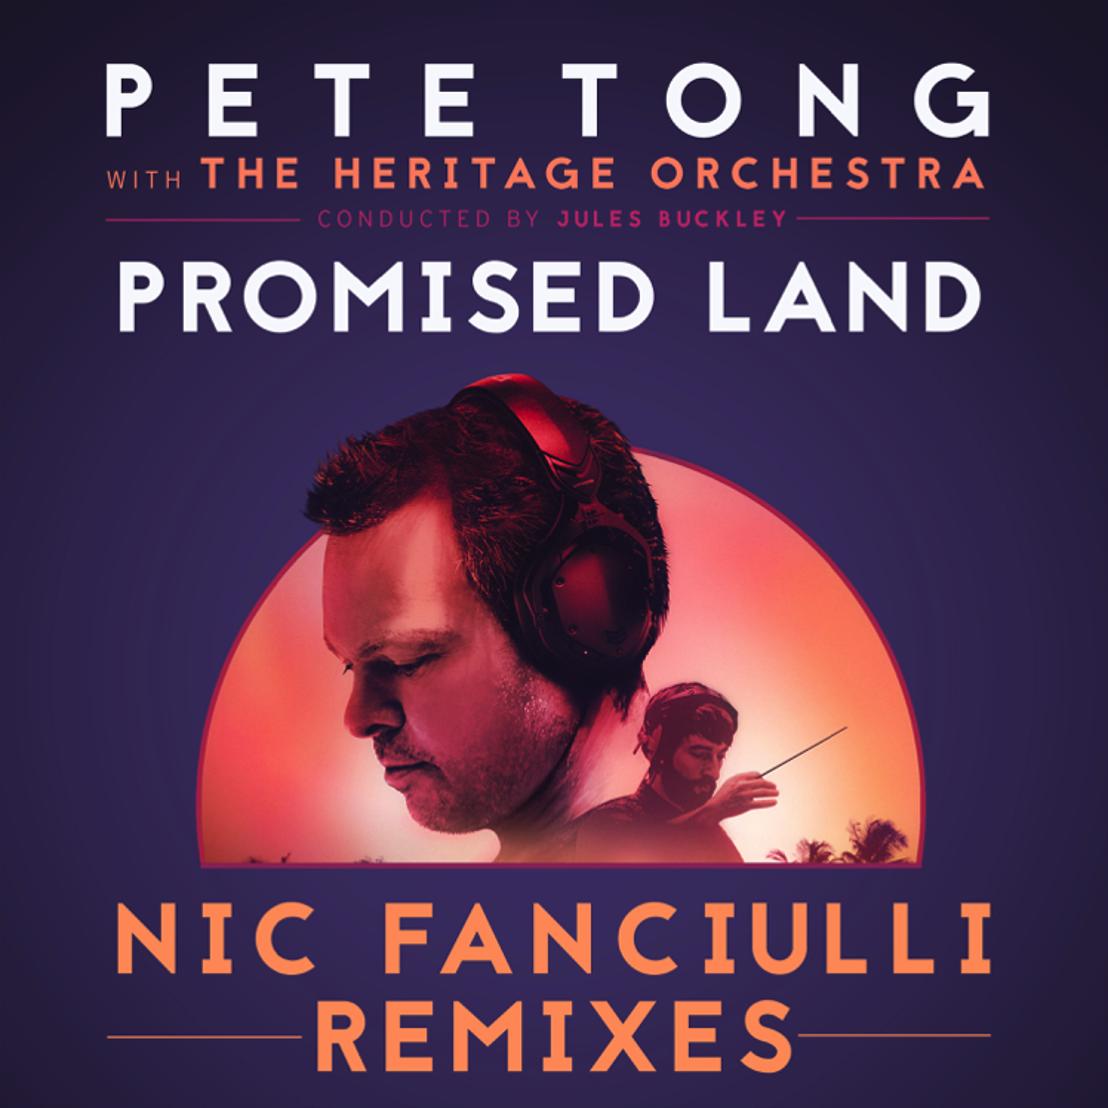 NIC FANCIULLI REMIXES 'PROMISED LAND' feat. DISCIPLES